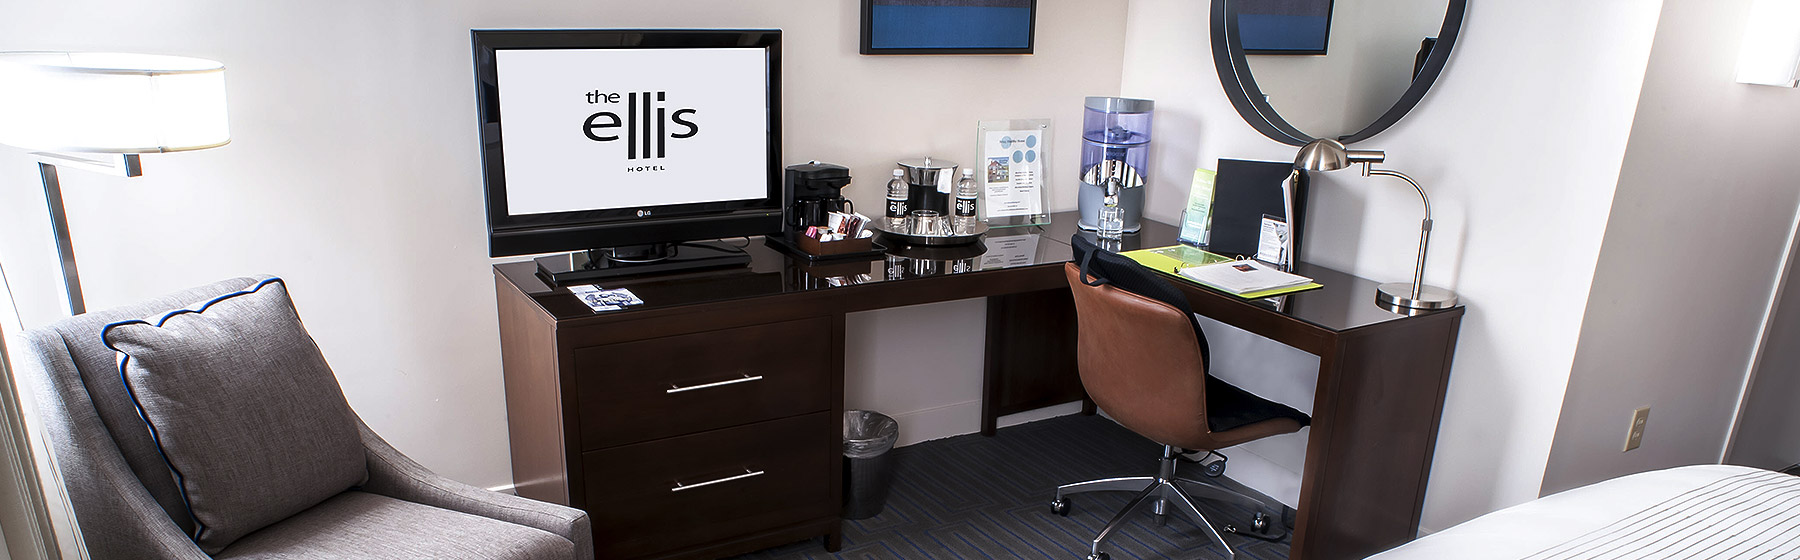 Wellness Room at The Ellis Hotel, Atlanta